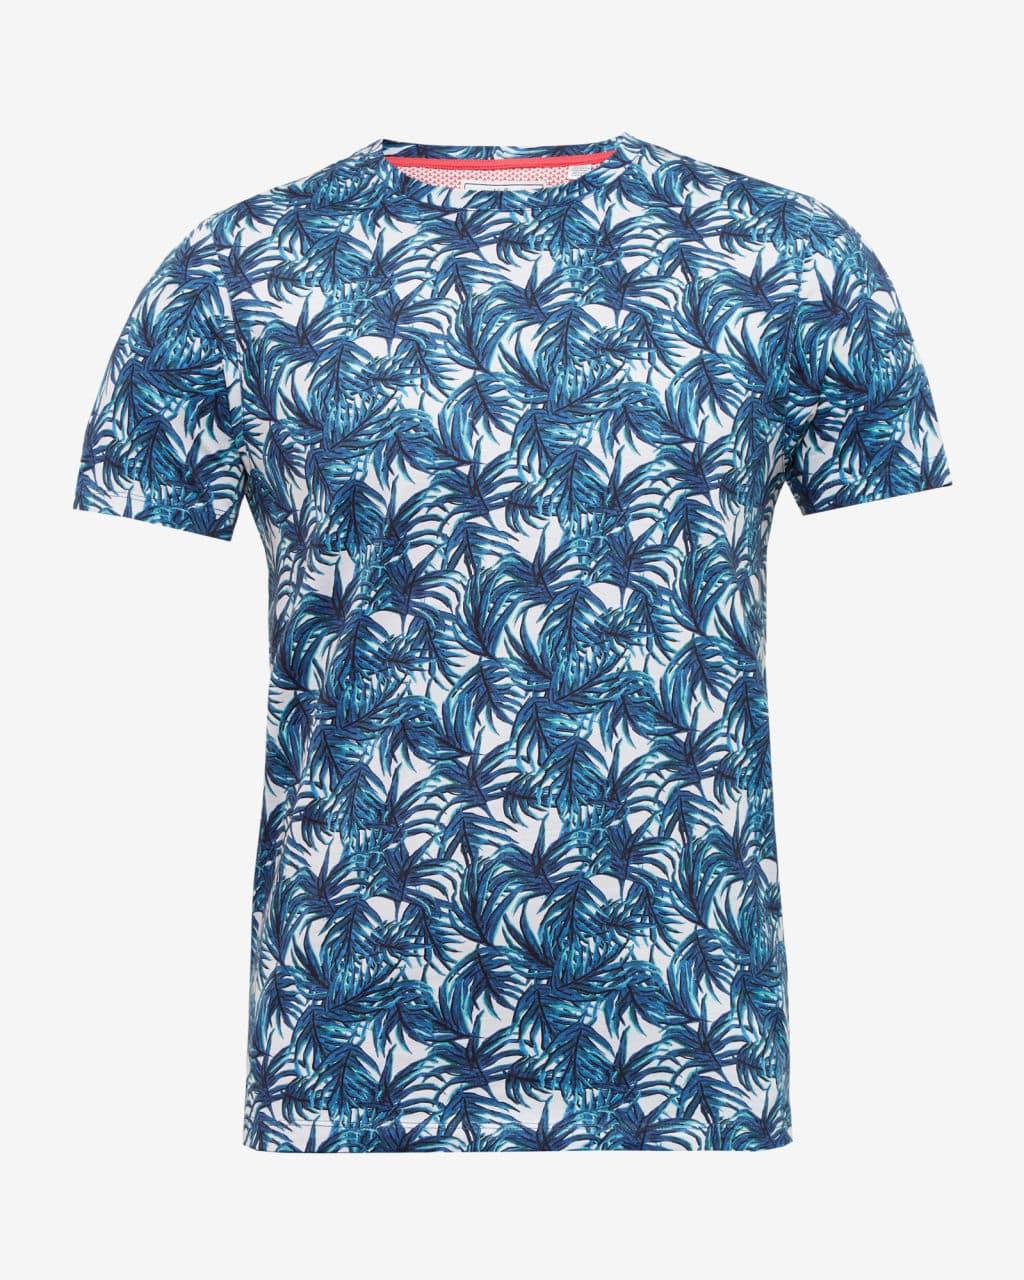 Ted baker blue retro leaf print t shirt for Vintage t shirt printing